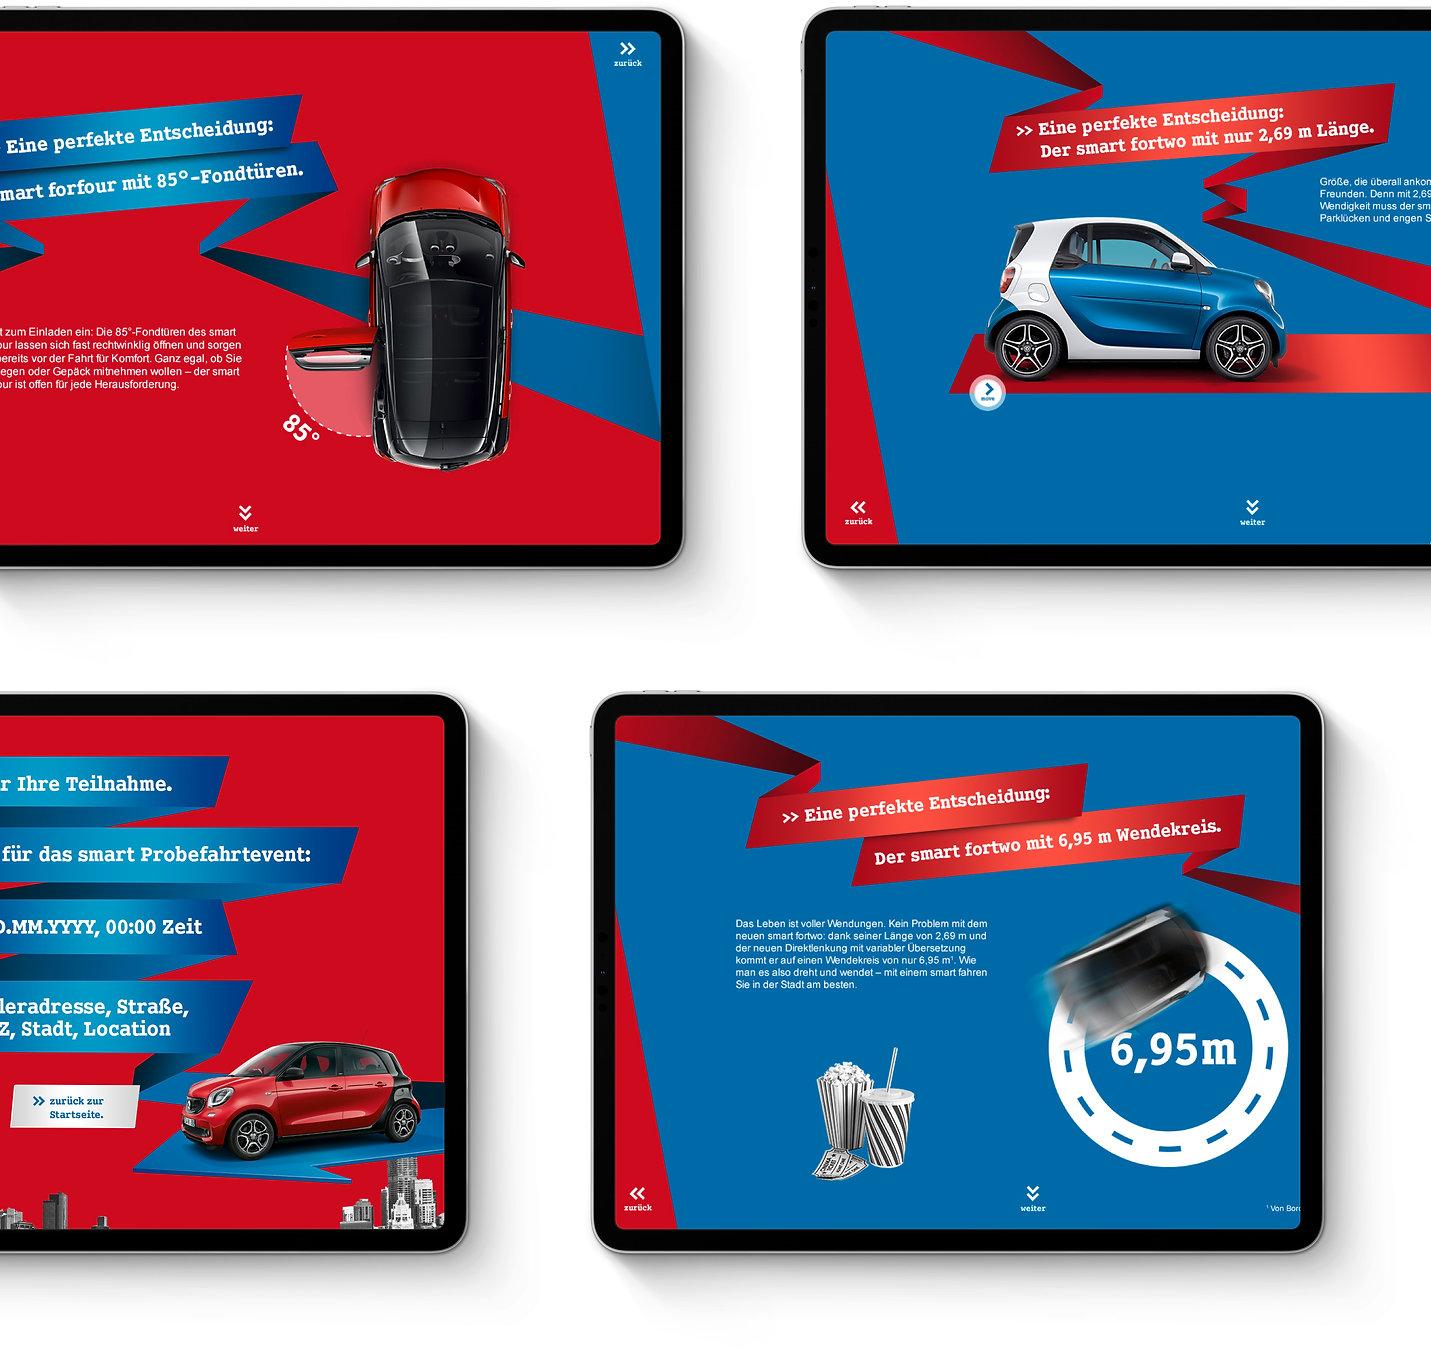 TB_iPads.jpg